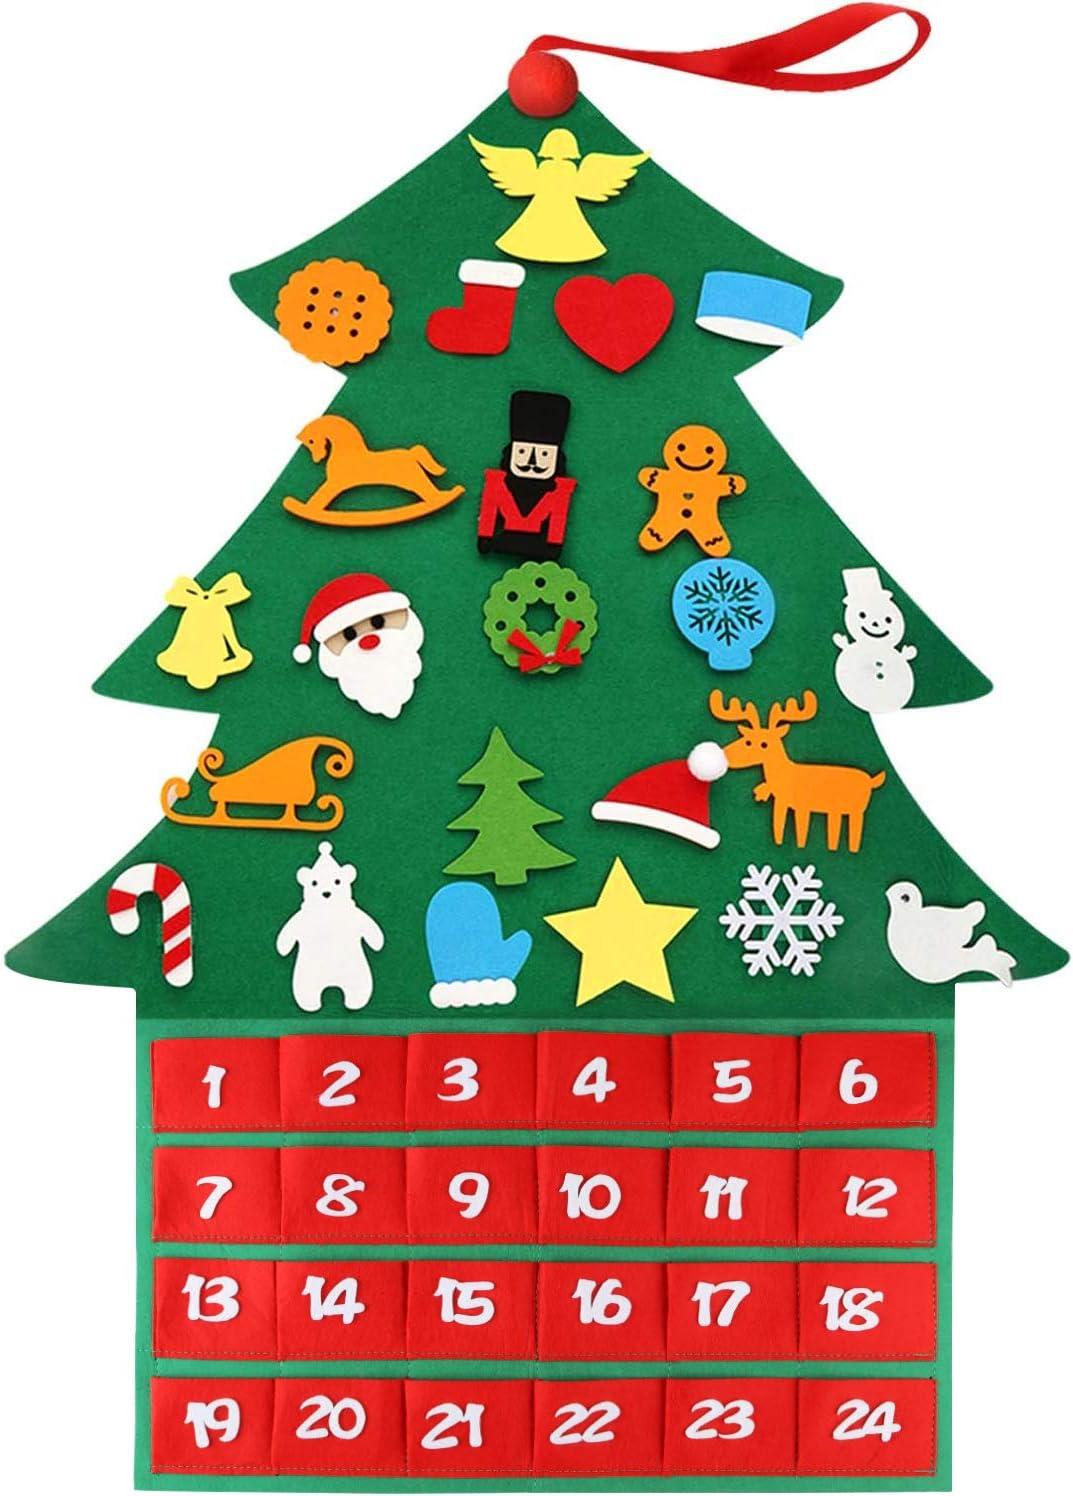 Ornament Set Felt Nativity Handmade Ornanaments Advent Collection Kids Advent Countdown